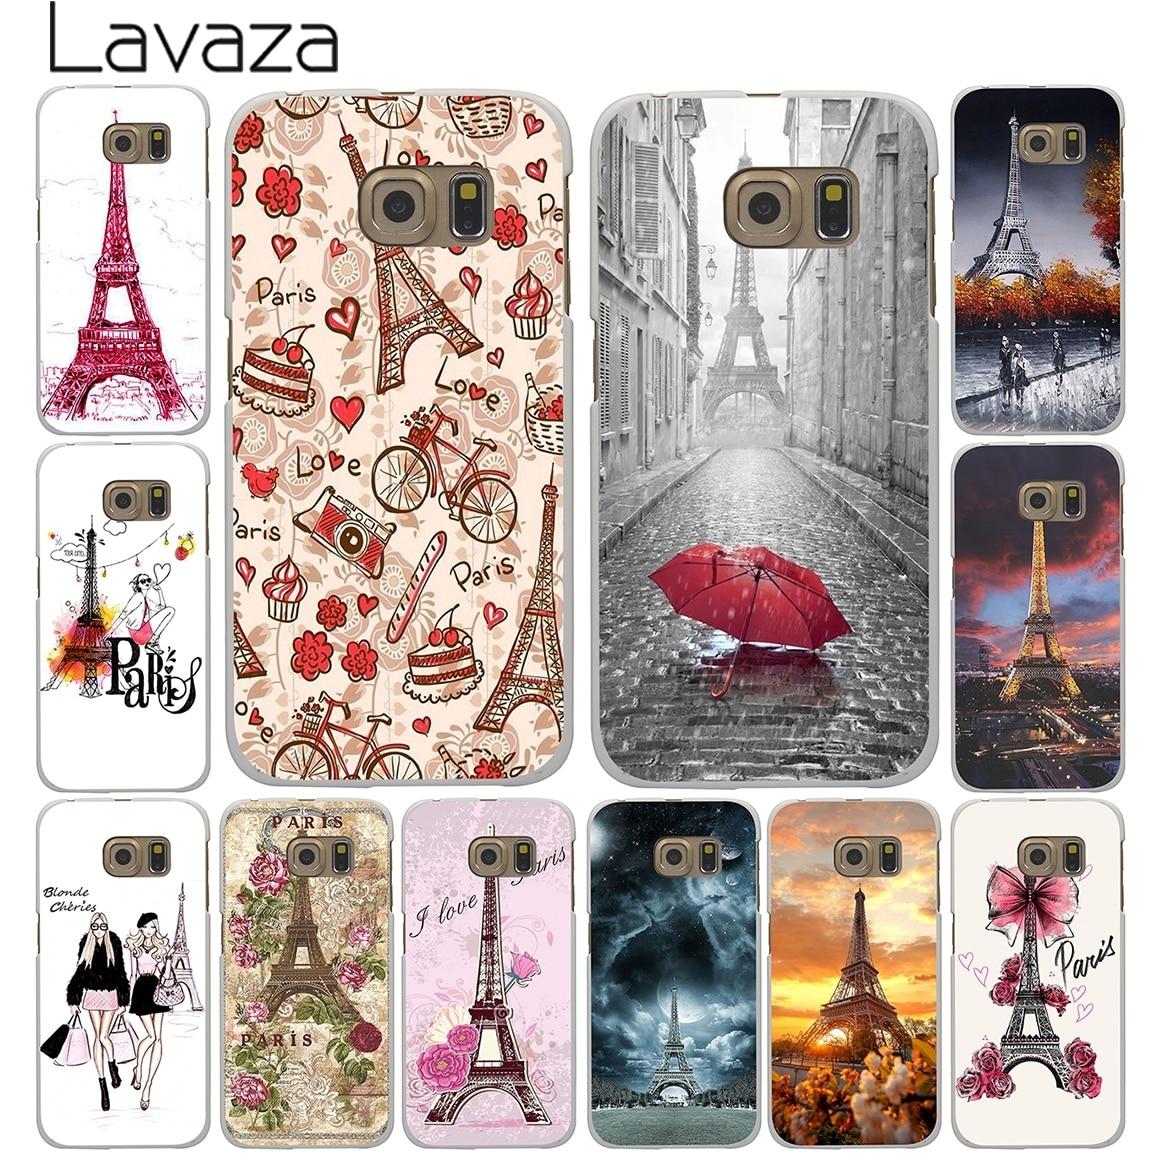 lavaza france paris the eiffel tower fashion case for samsung galaxy a3 a5 a7 a8 j3 j5 j7 2015. Black Bedroom Furniture Sets. Home Design Ideas